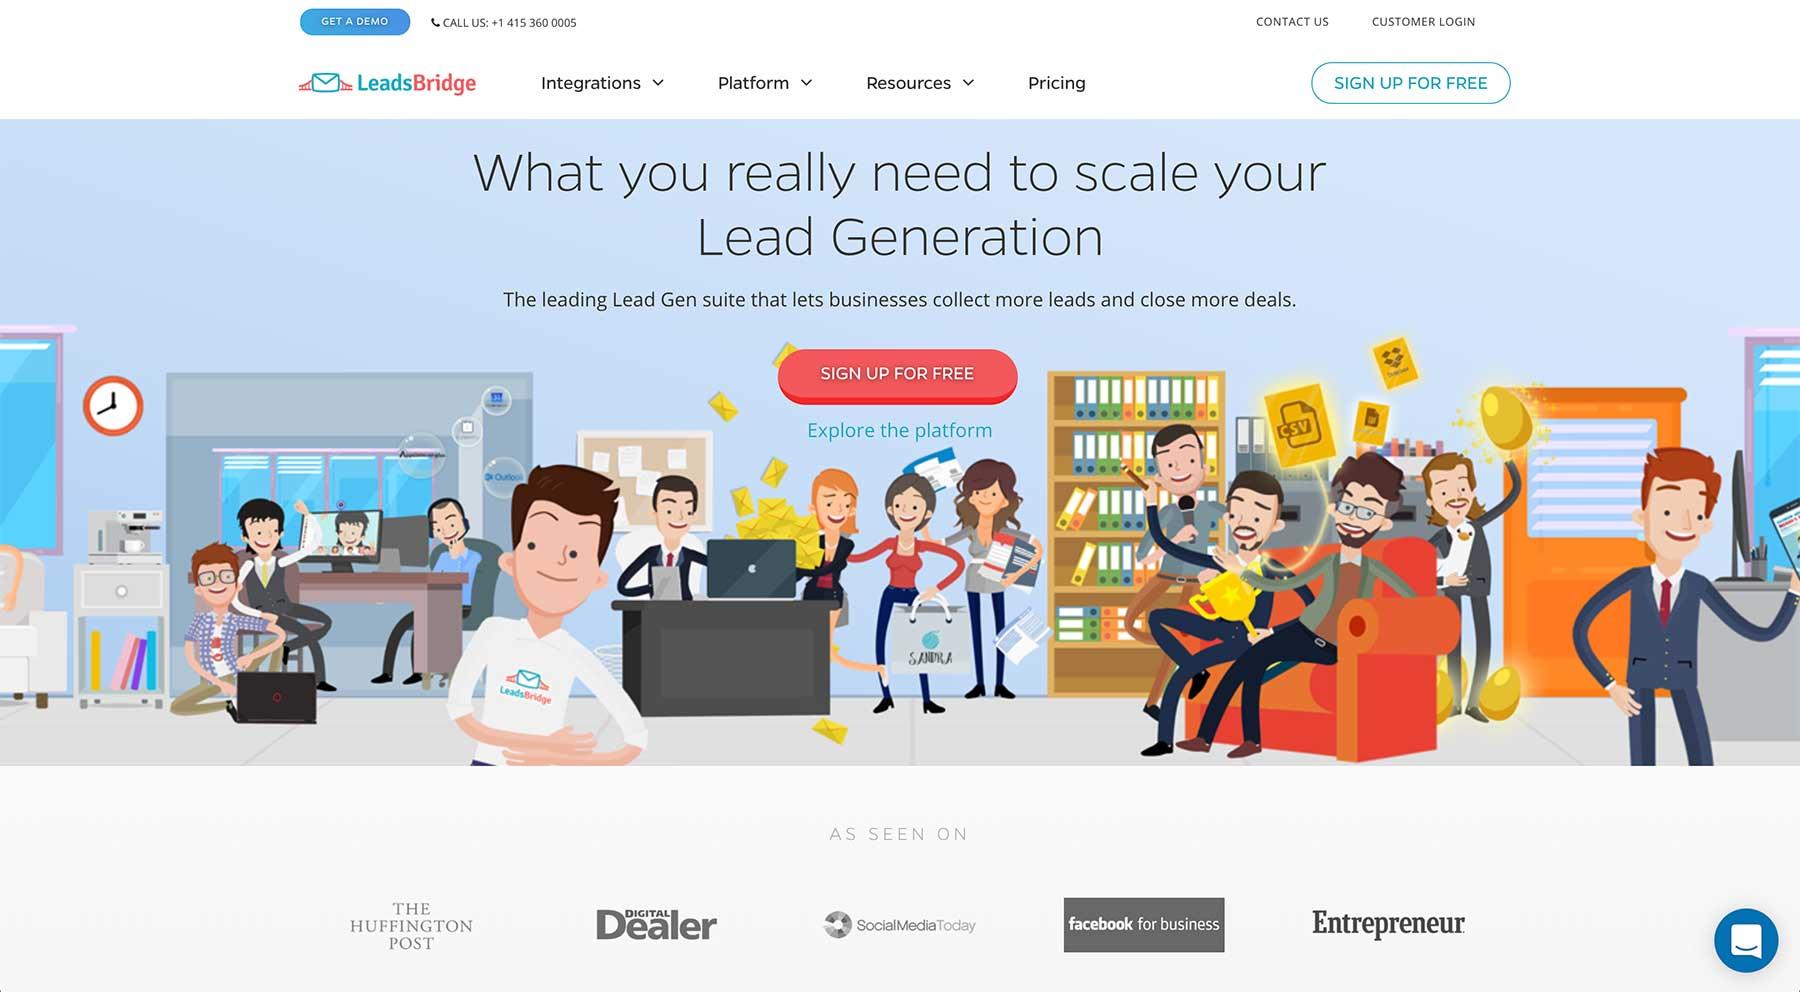 LeadsBridge website